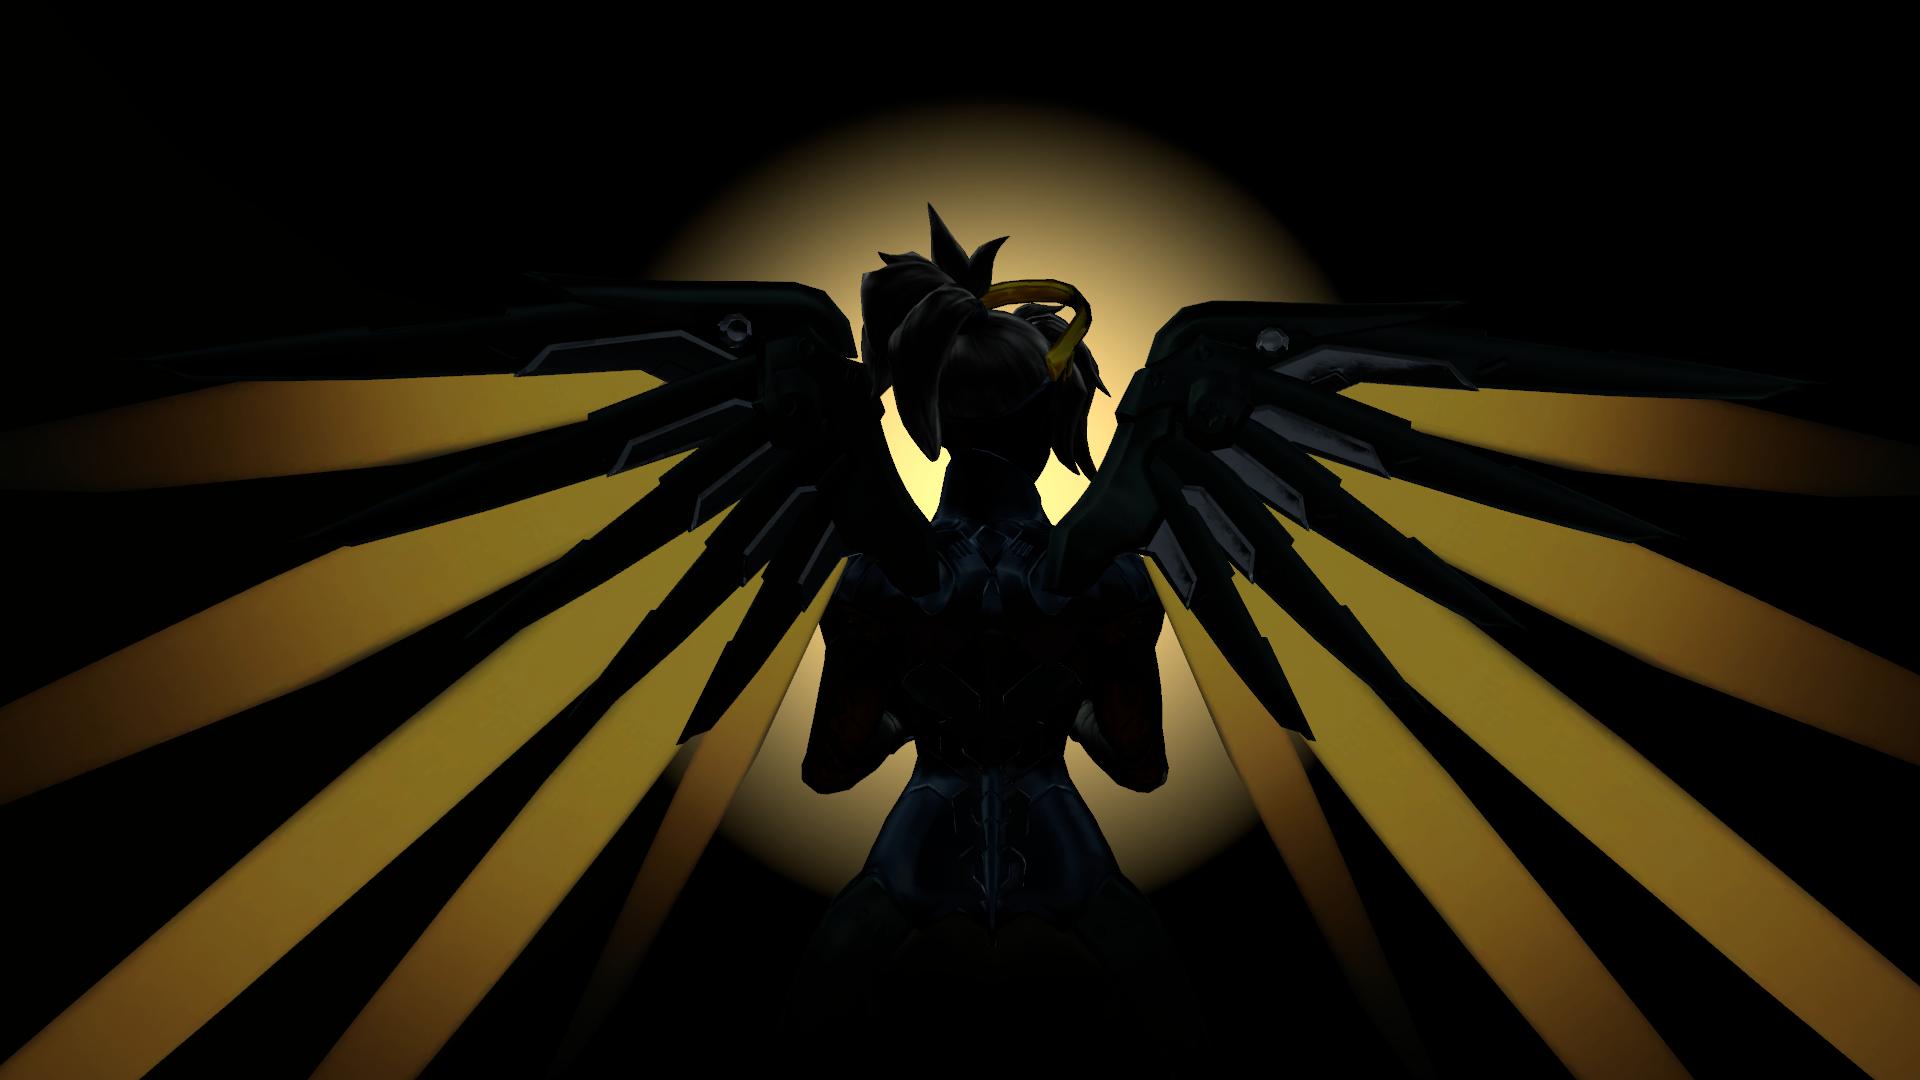 Overwatch HD Wallpaper | Background Image | 1920x1080 | ID ...